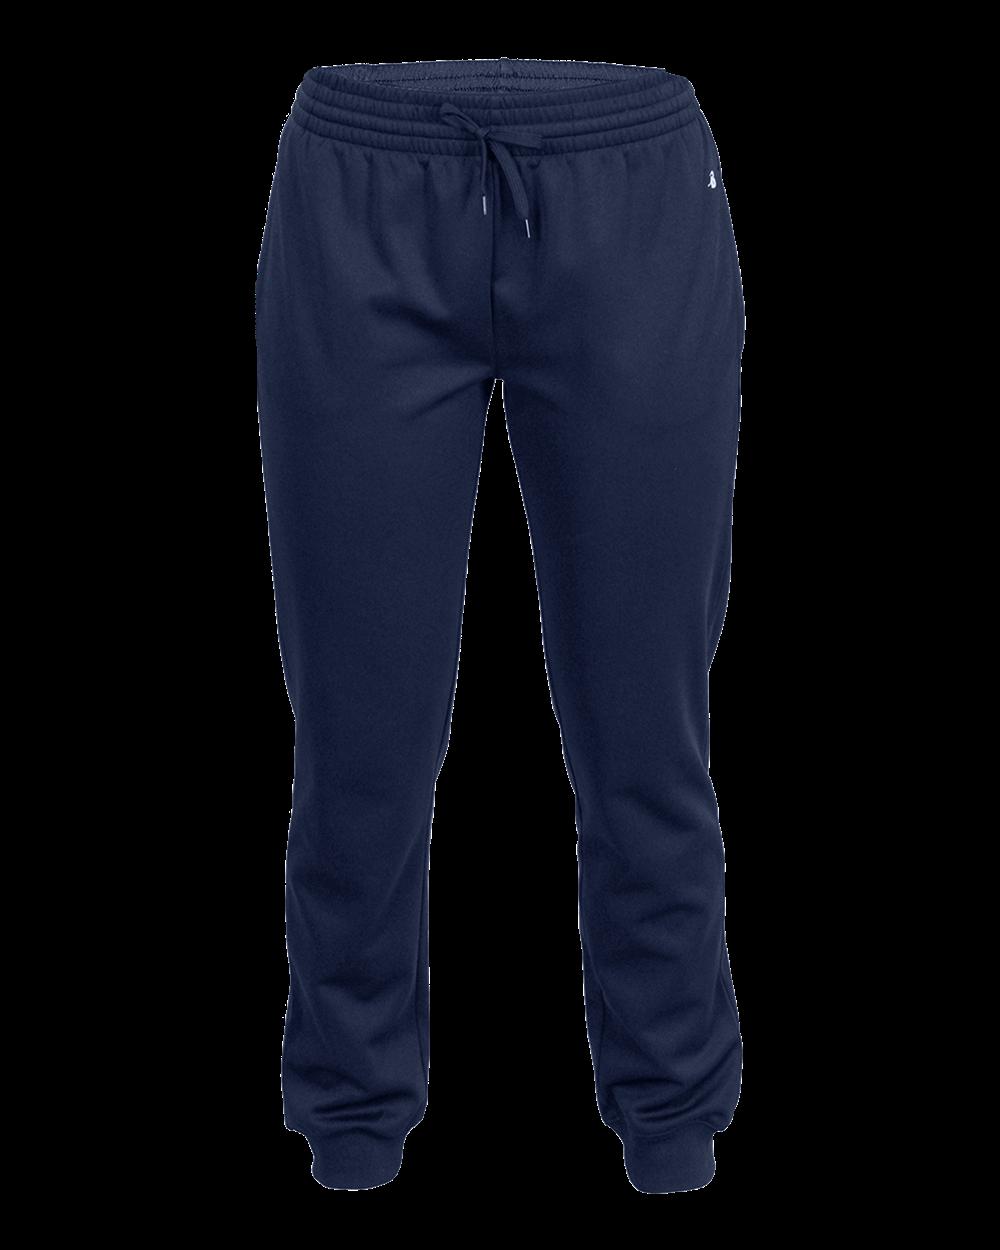 Jogger Women's Pant - Navy